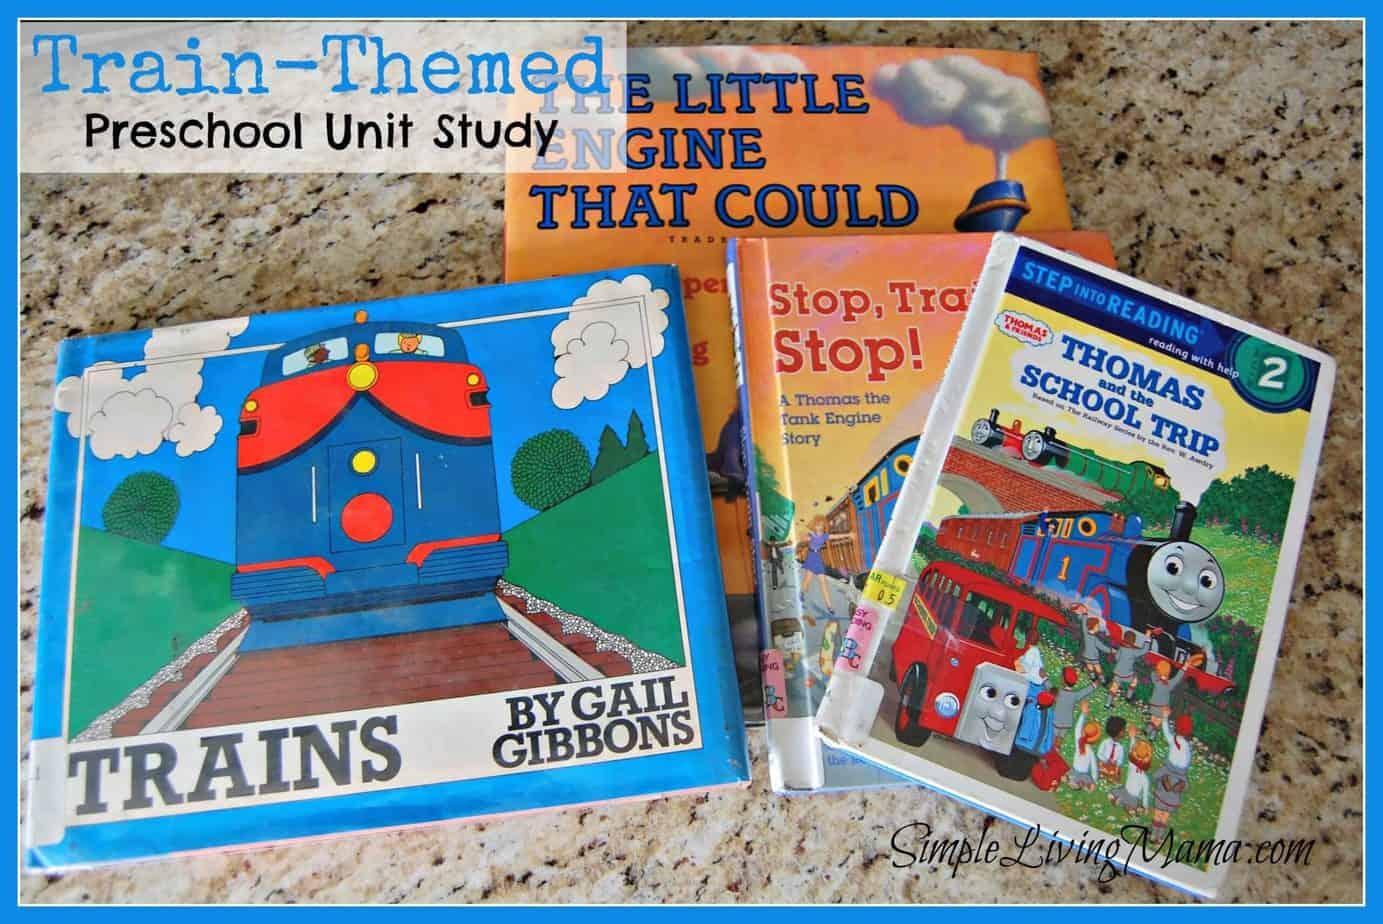 Train Themed Preschool Unit Study